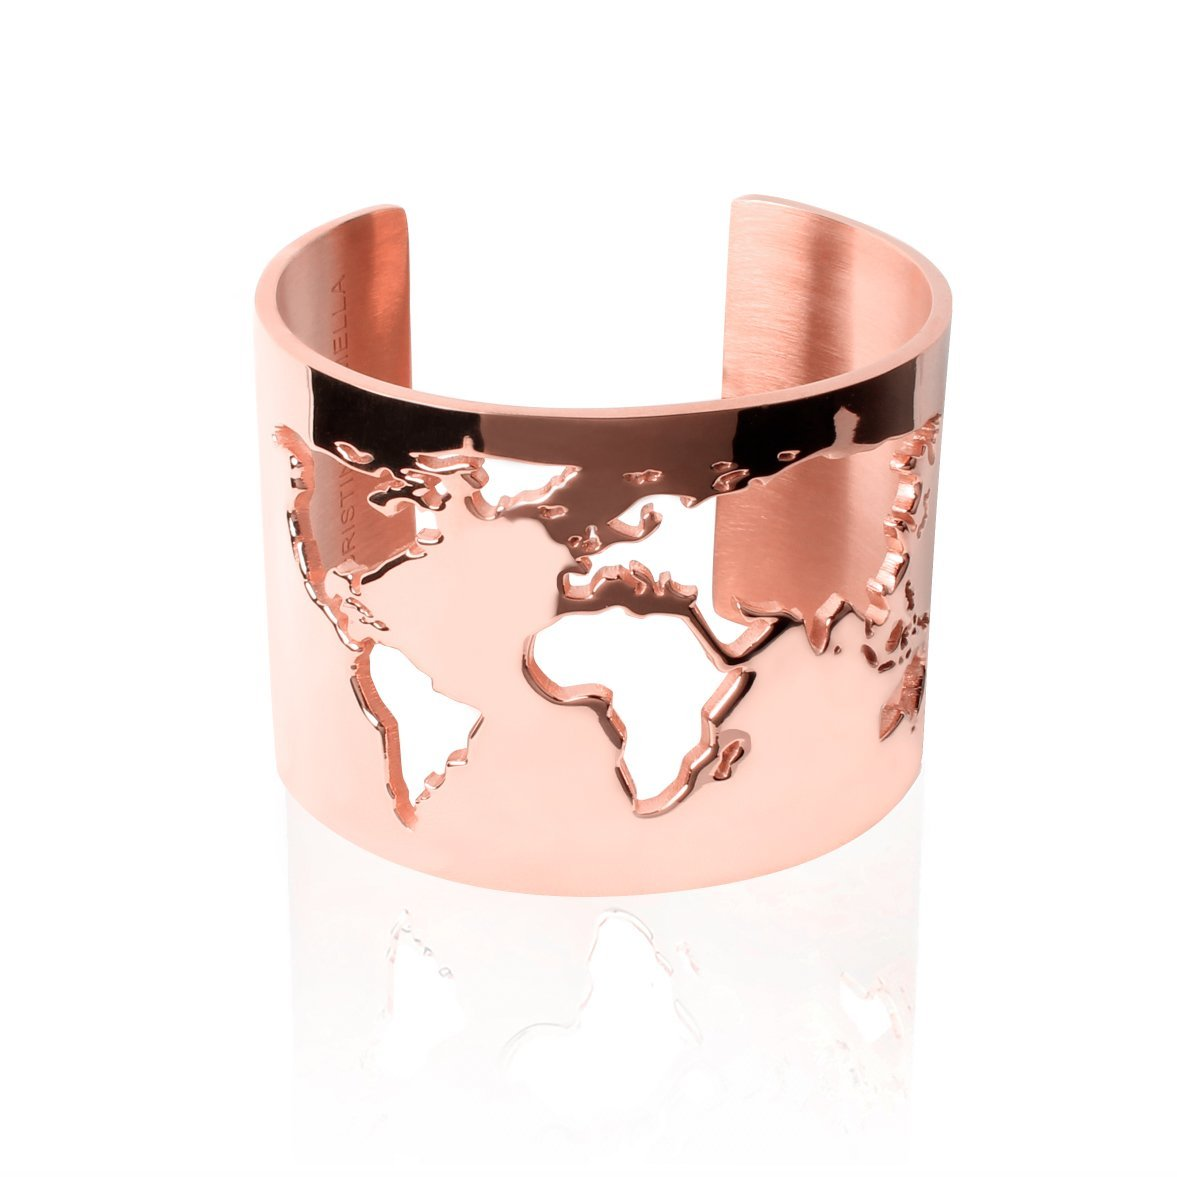 WORLD CUFF 24K Rose Gold Plated Travel Jewelry